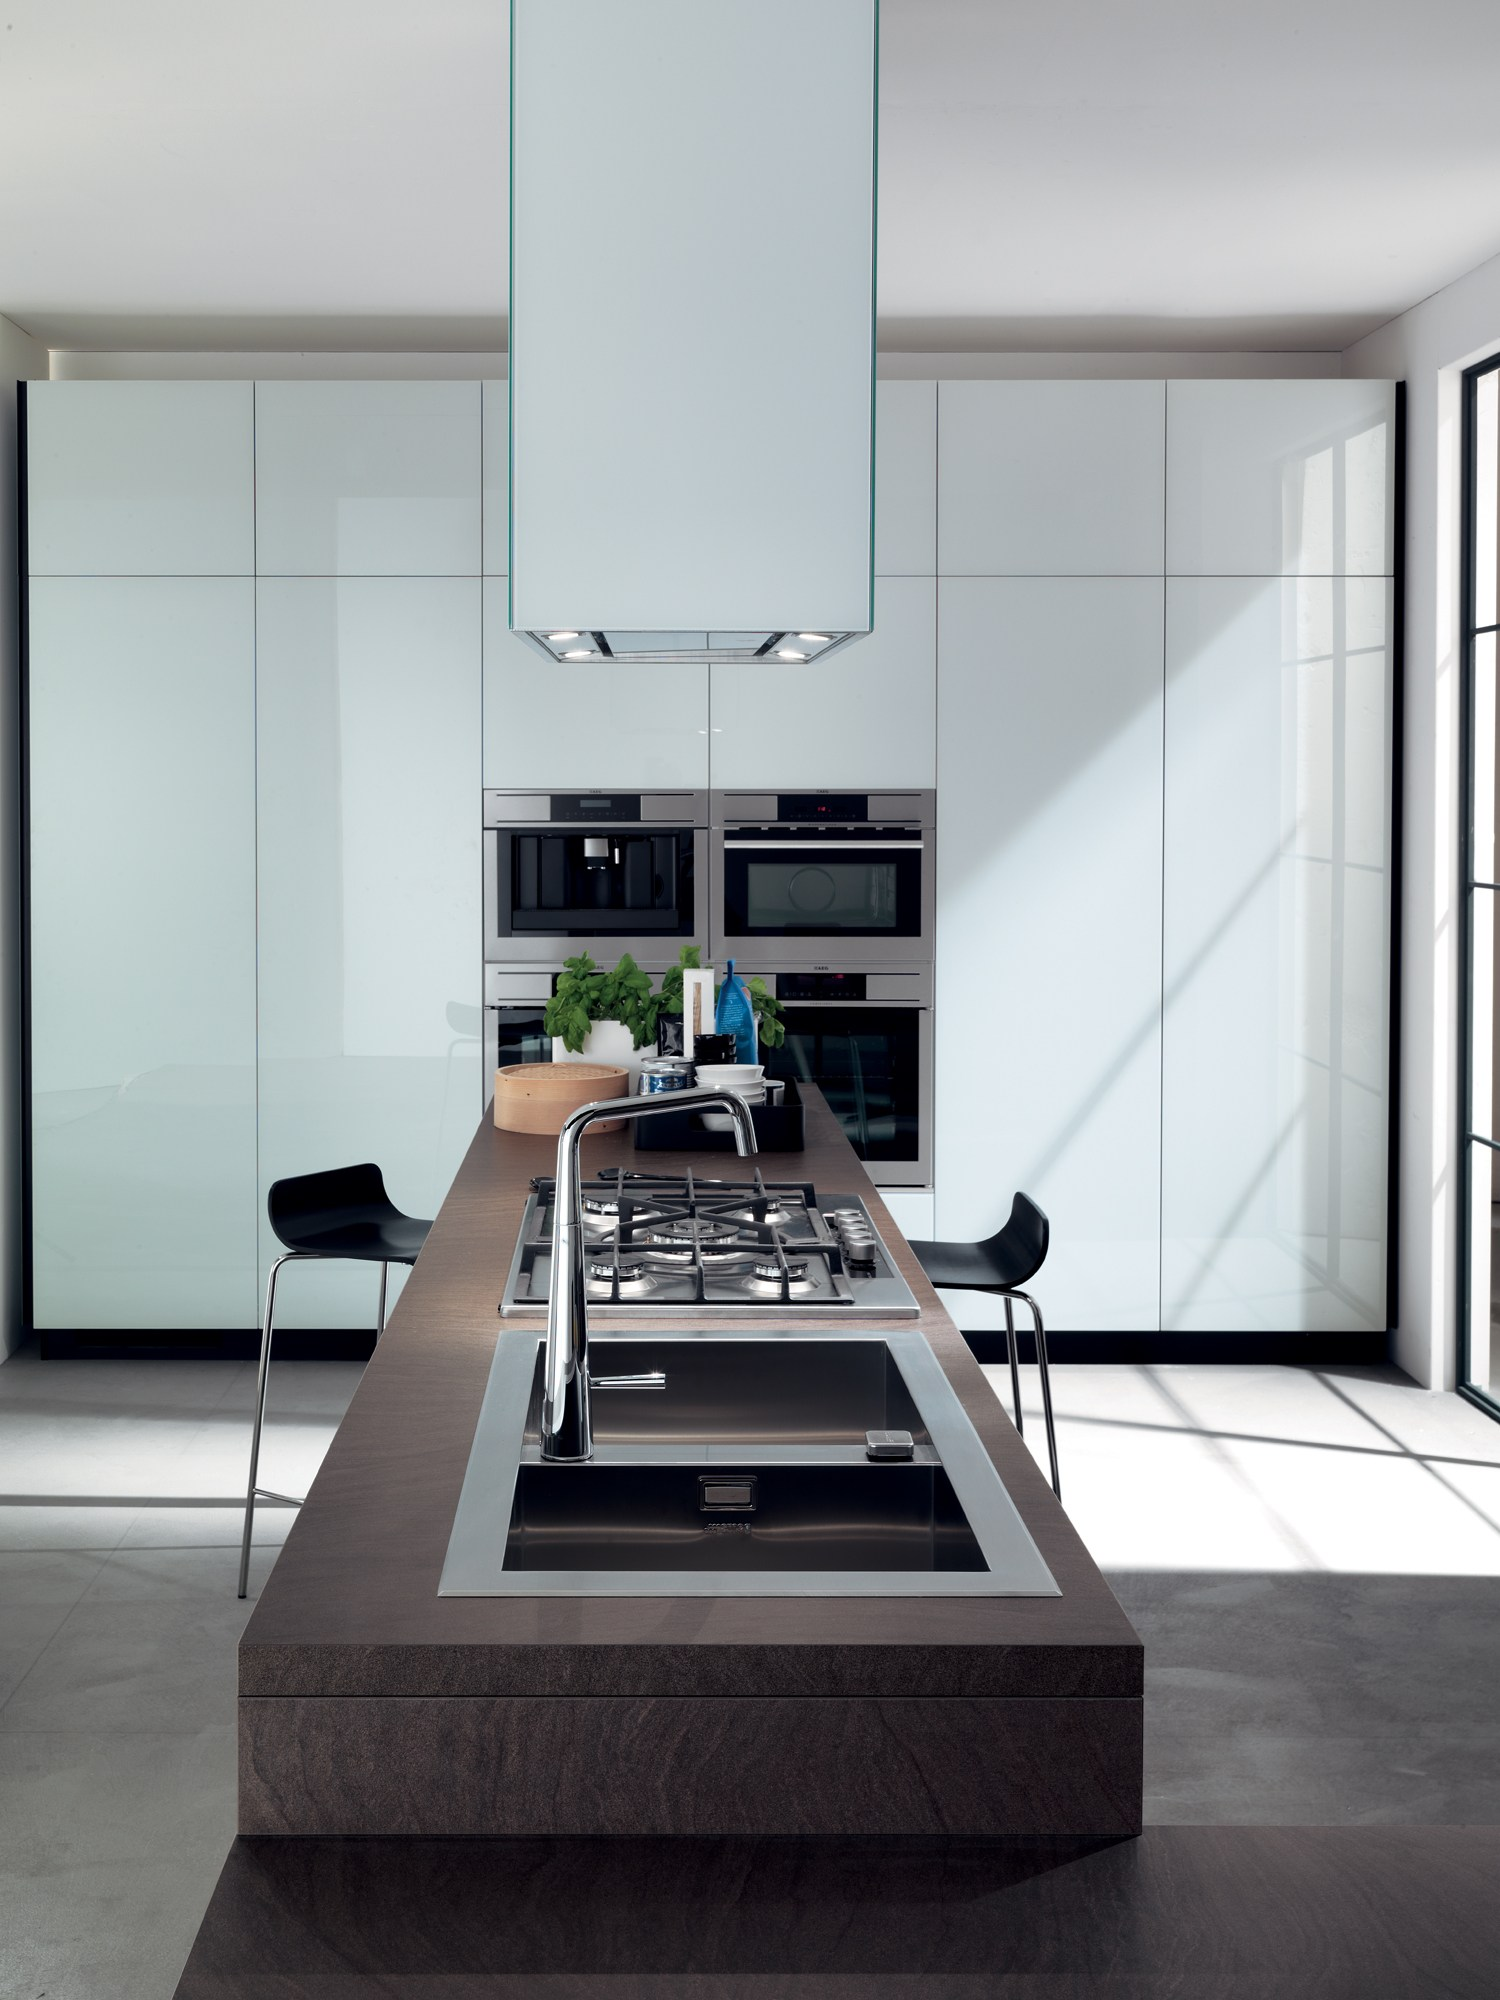 Best Cucine Componibili Scavolini Prezzi Photos - Ideas & Design ...